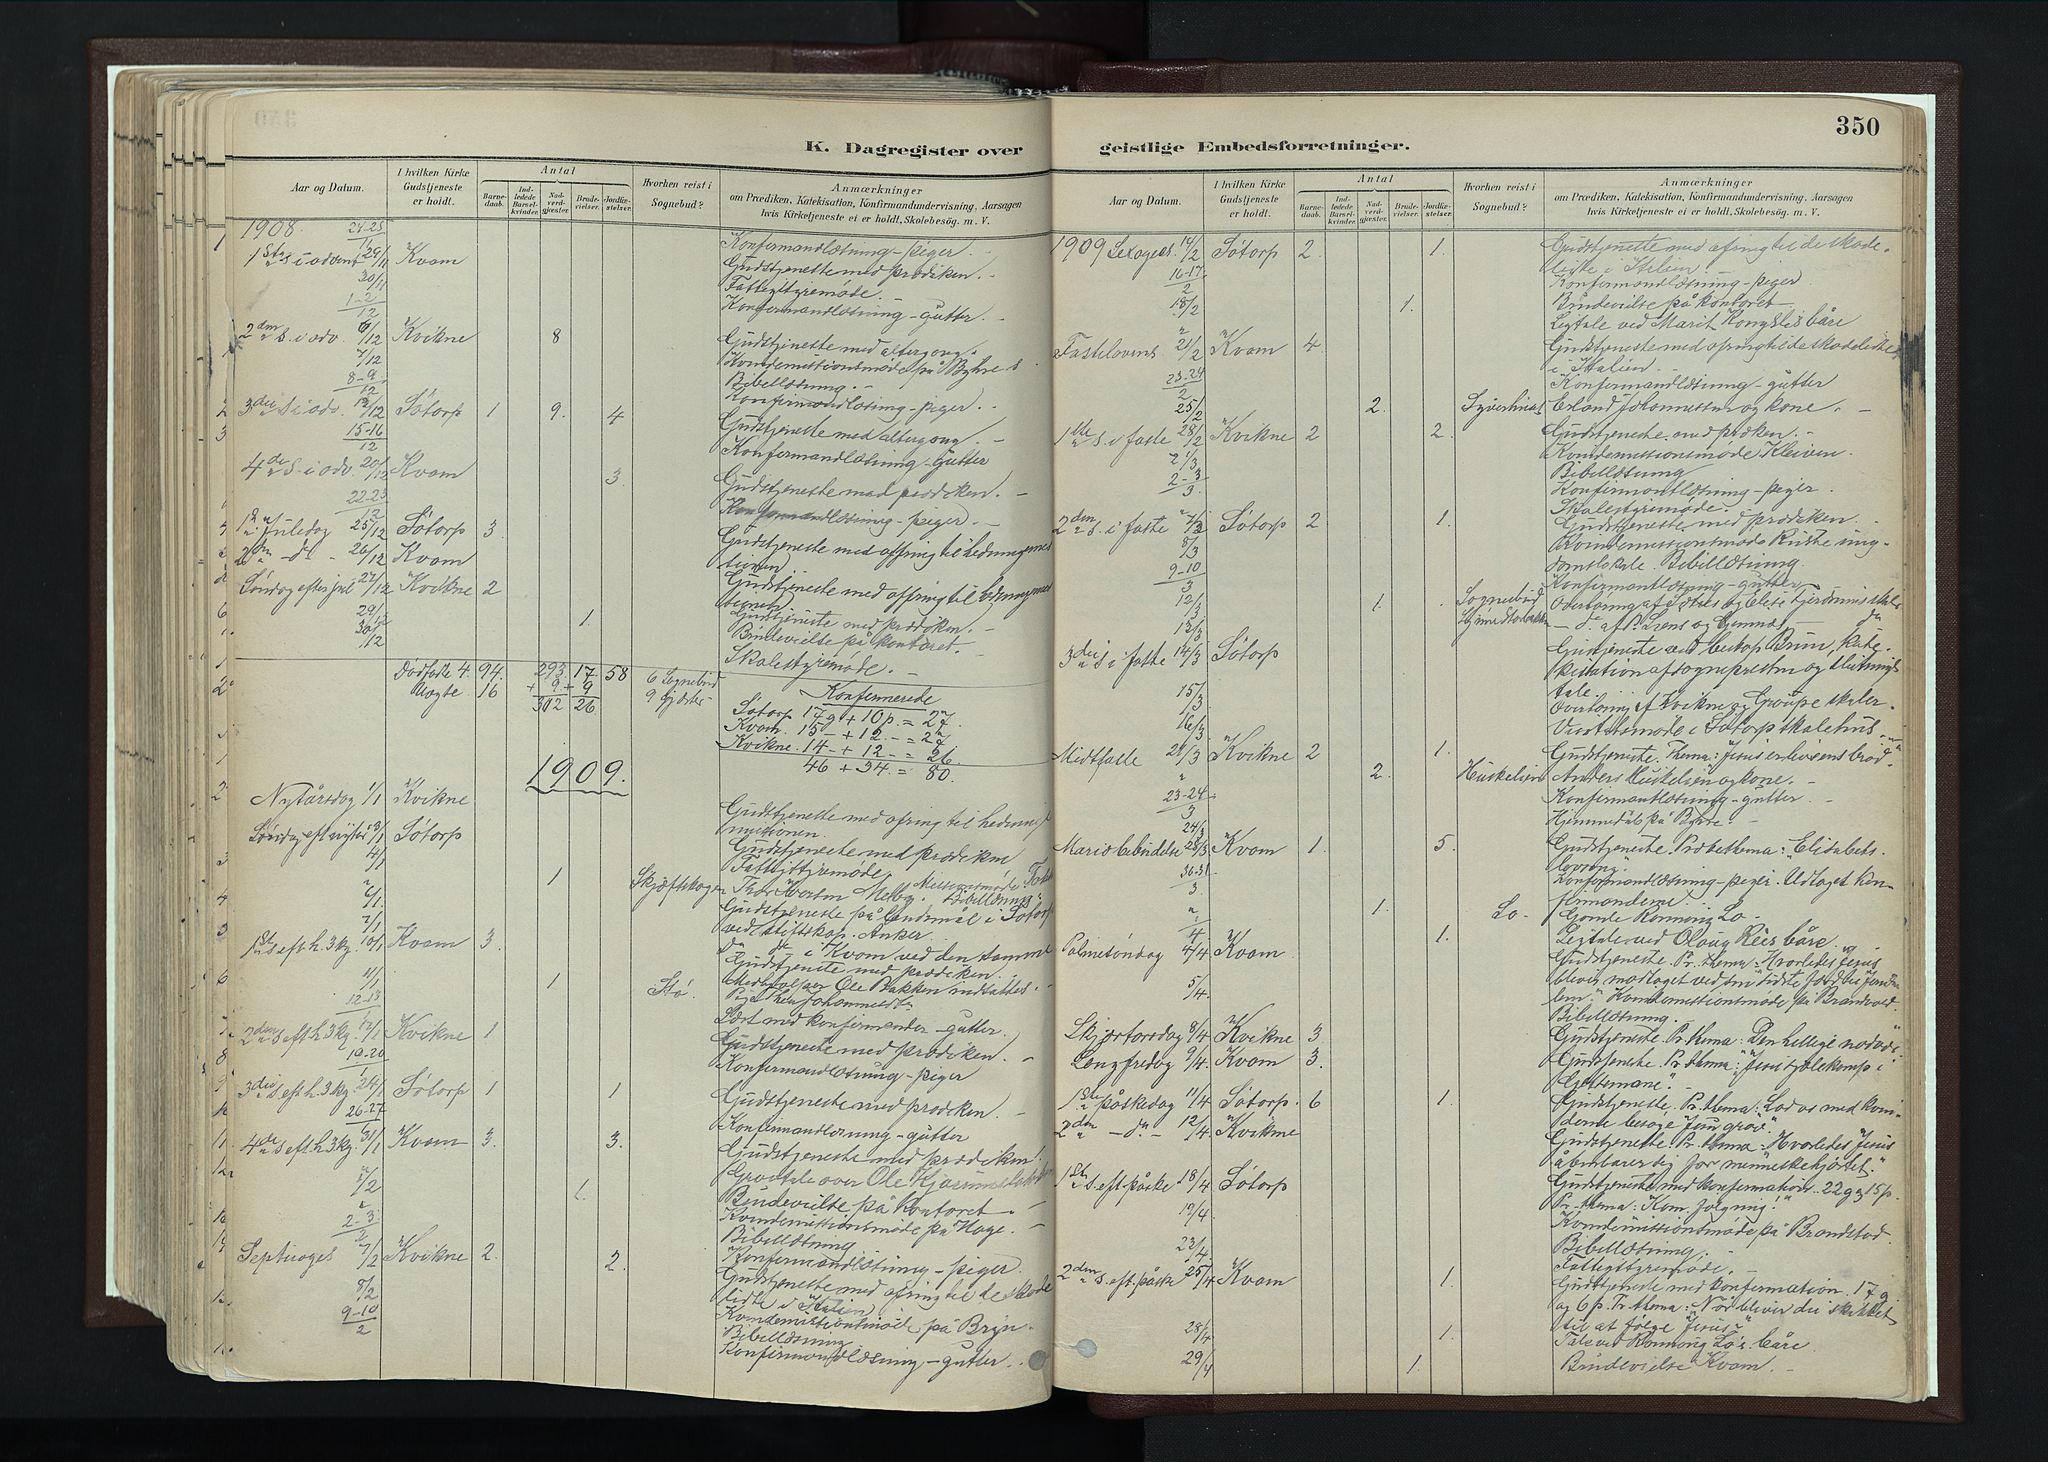 SAH, Nord-Fron prestekontor, Ministerialbok nr. 4, 1884-1914, s. 350